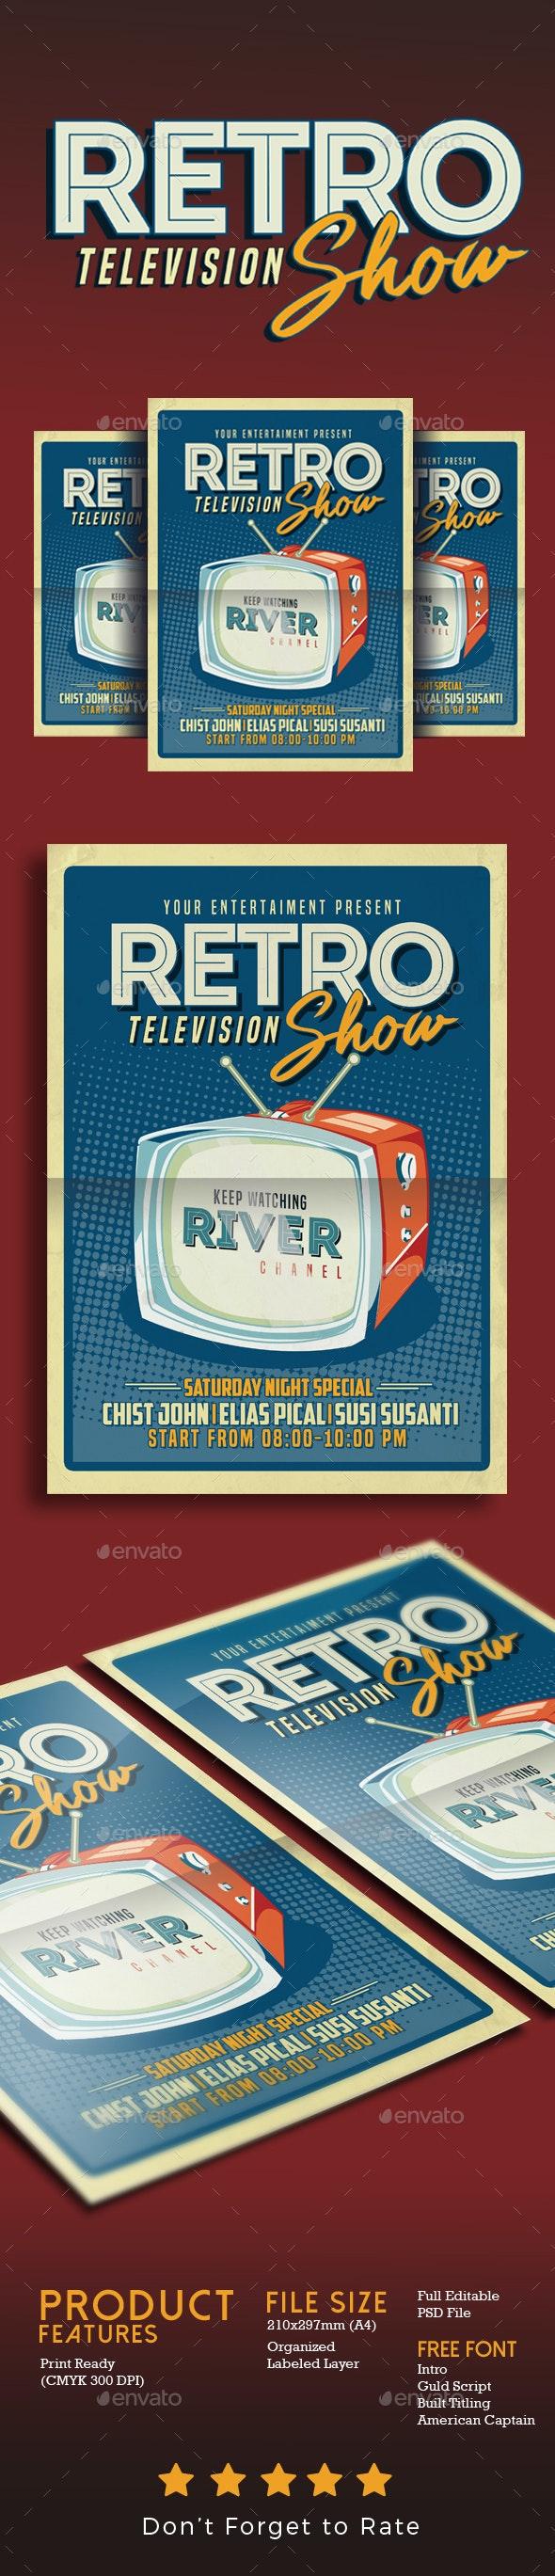 Retro TV show Flyer Poster - Flyers Print Templates